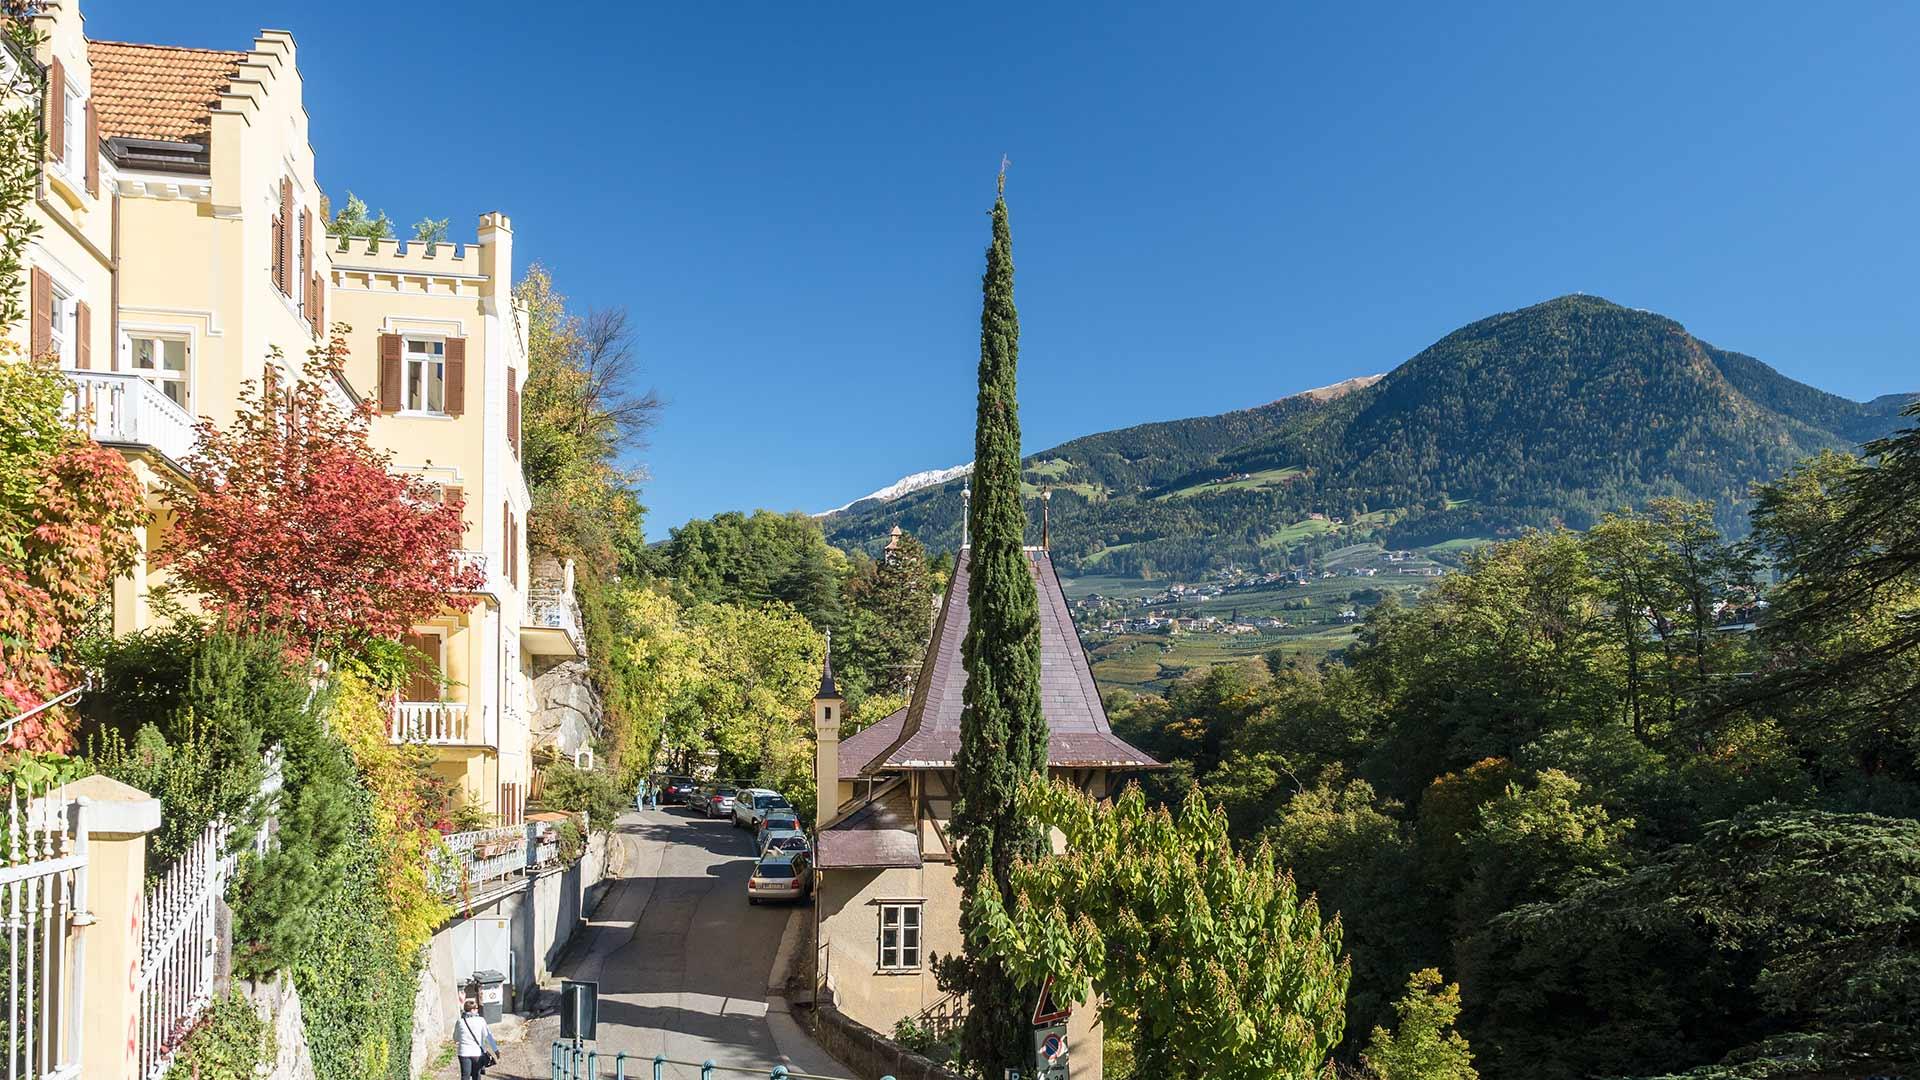 Merano in Alto Adige